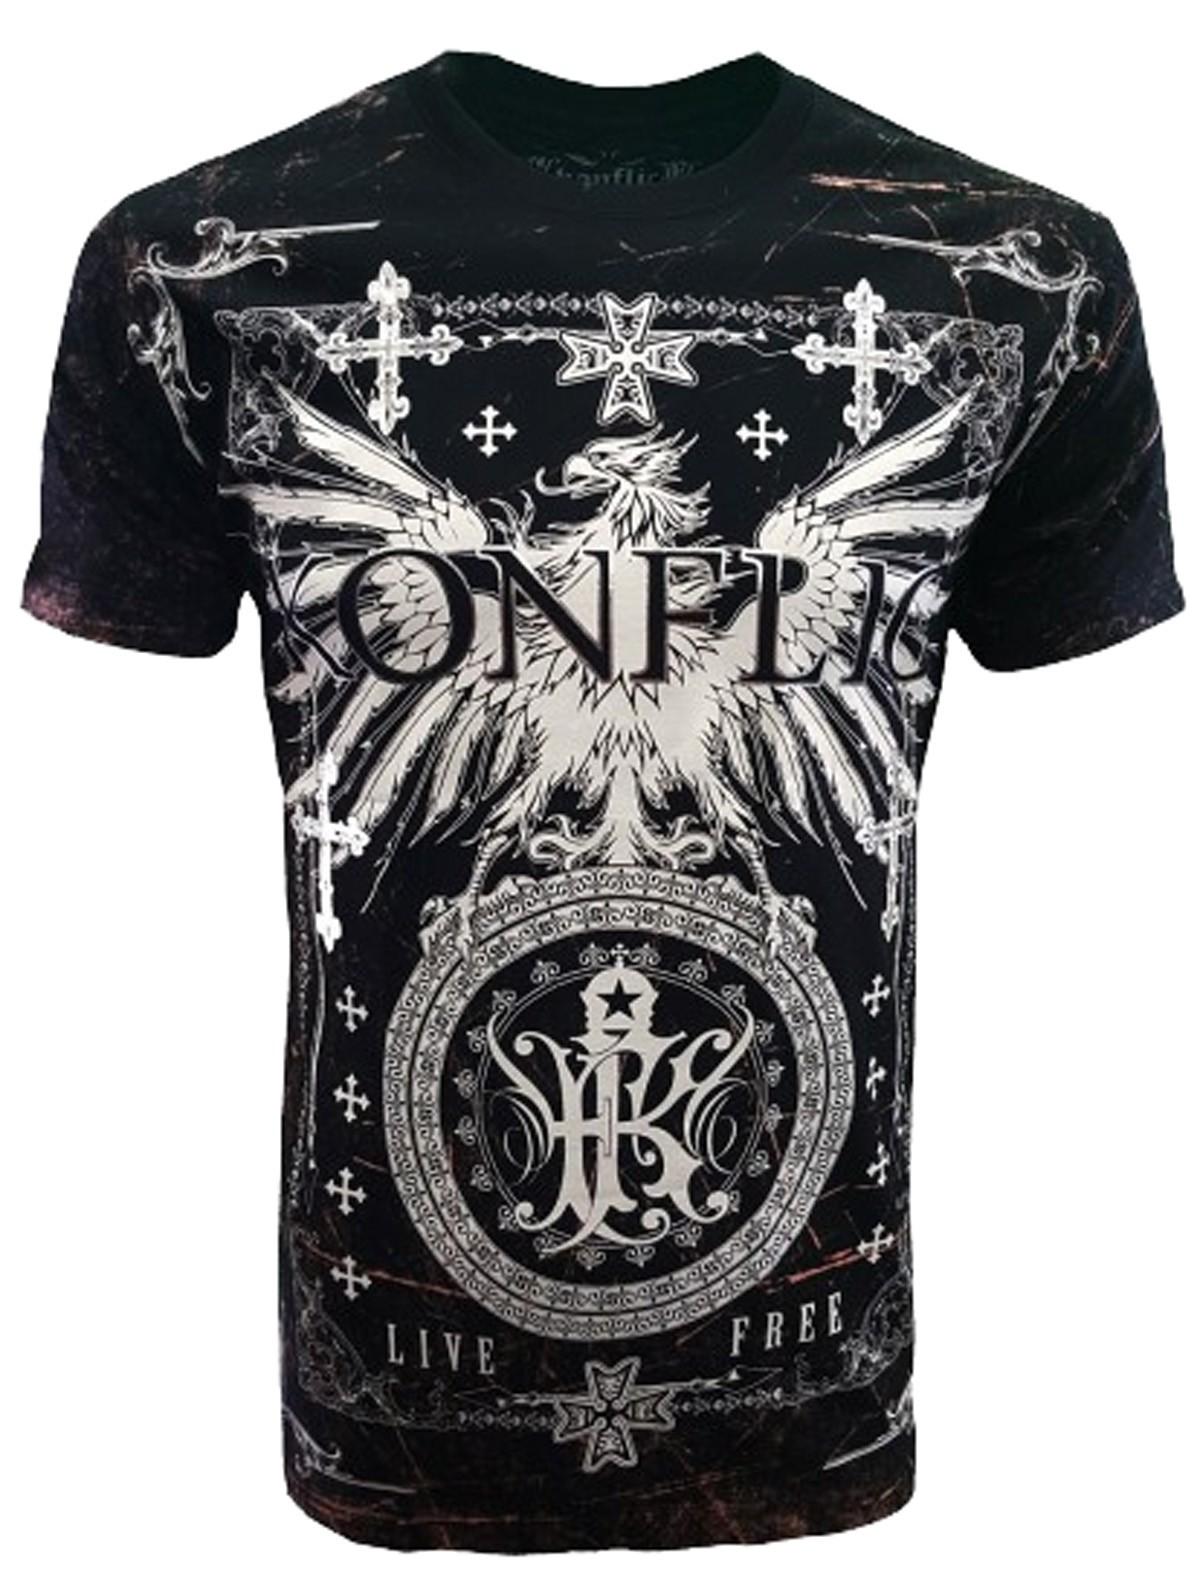 Konflic Clothing - Phoenix Motif T-Shirt